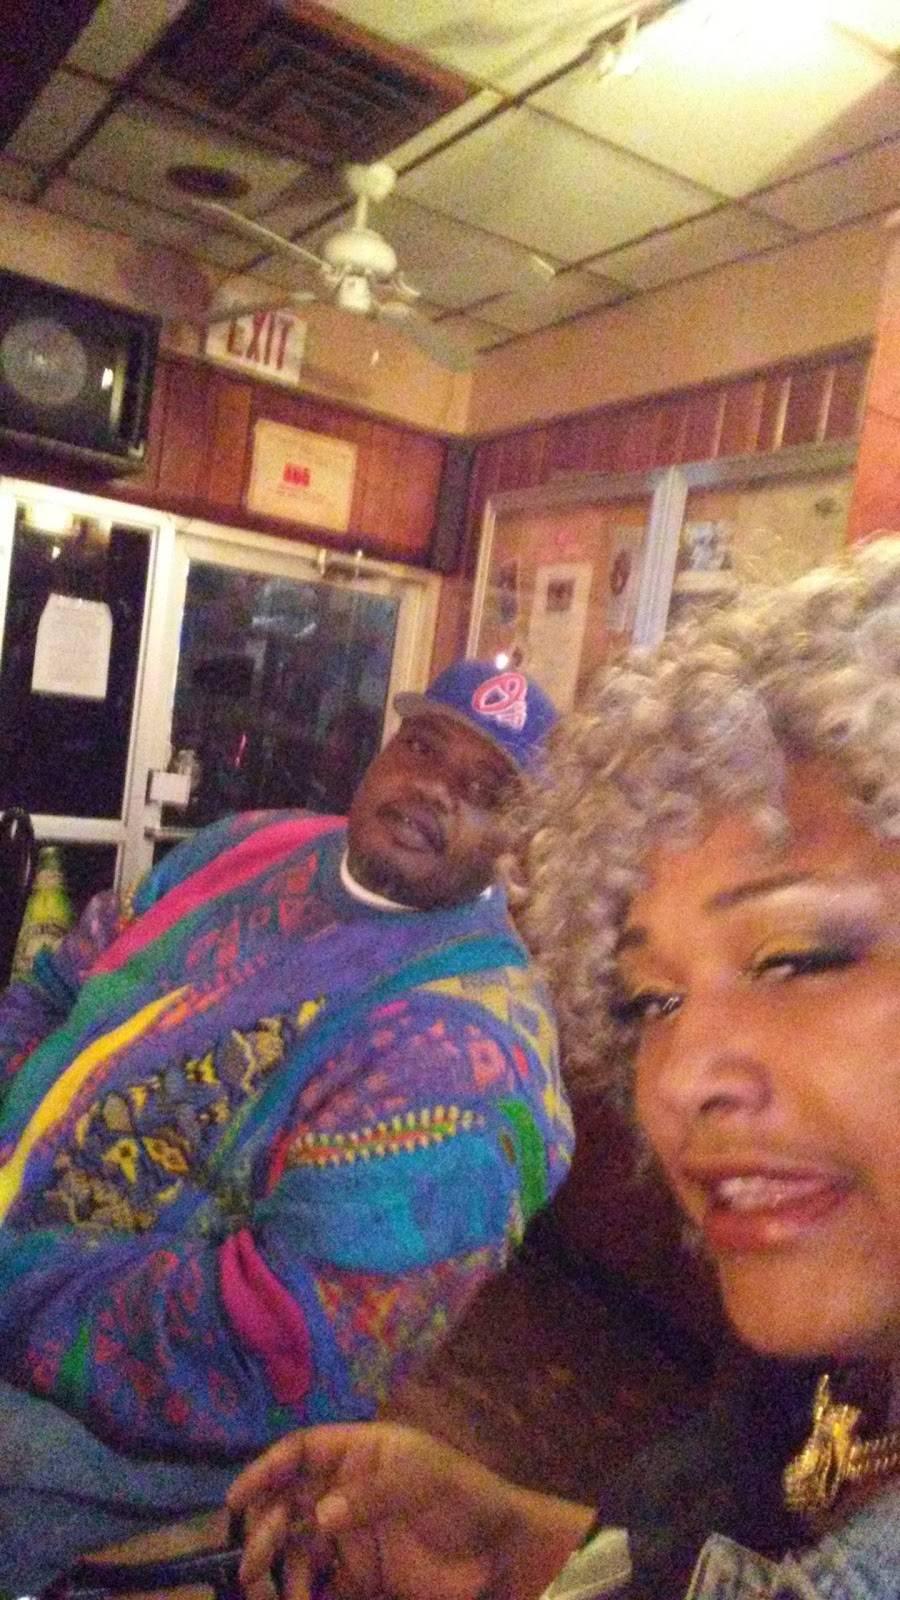 Garrison Lounge - night club  | Photo 6 of 6 | Address: 3403 Clifton Ave, Baltimore, MD 21216, USA | Phone: (410) 947-2849